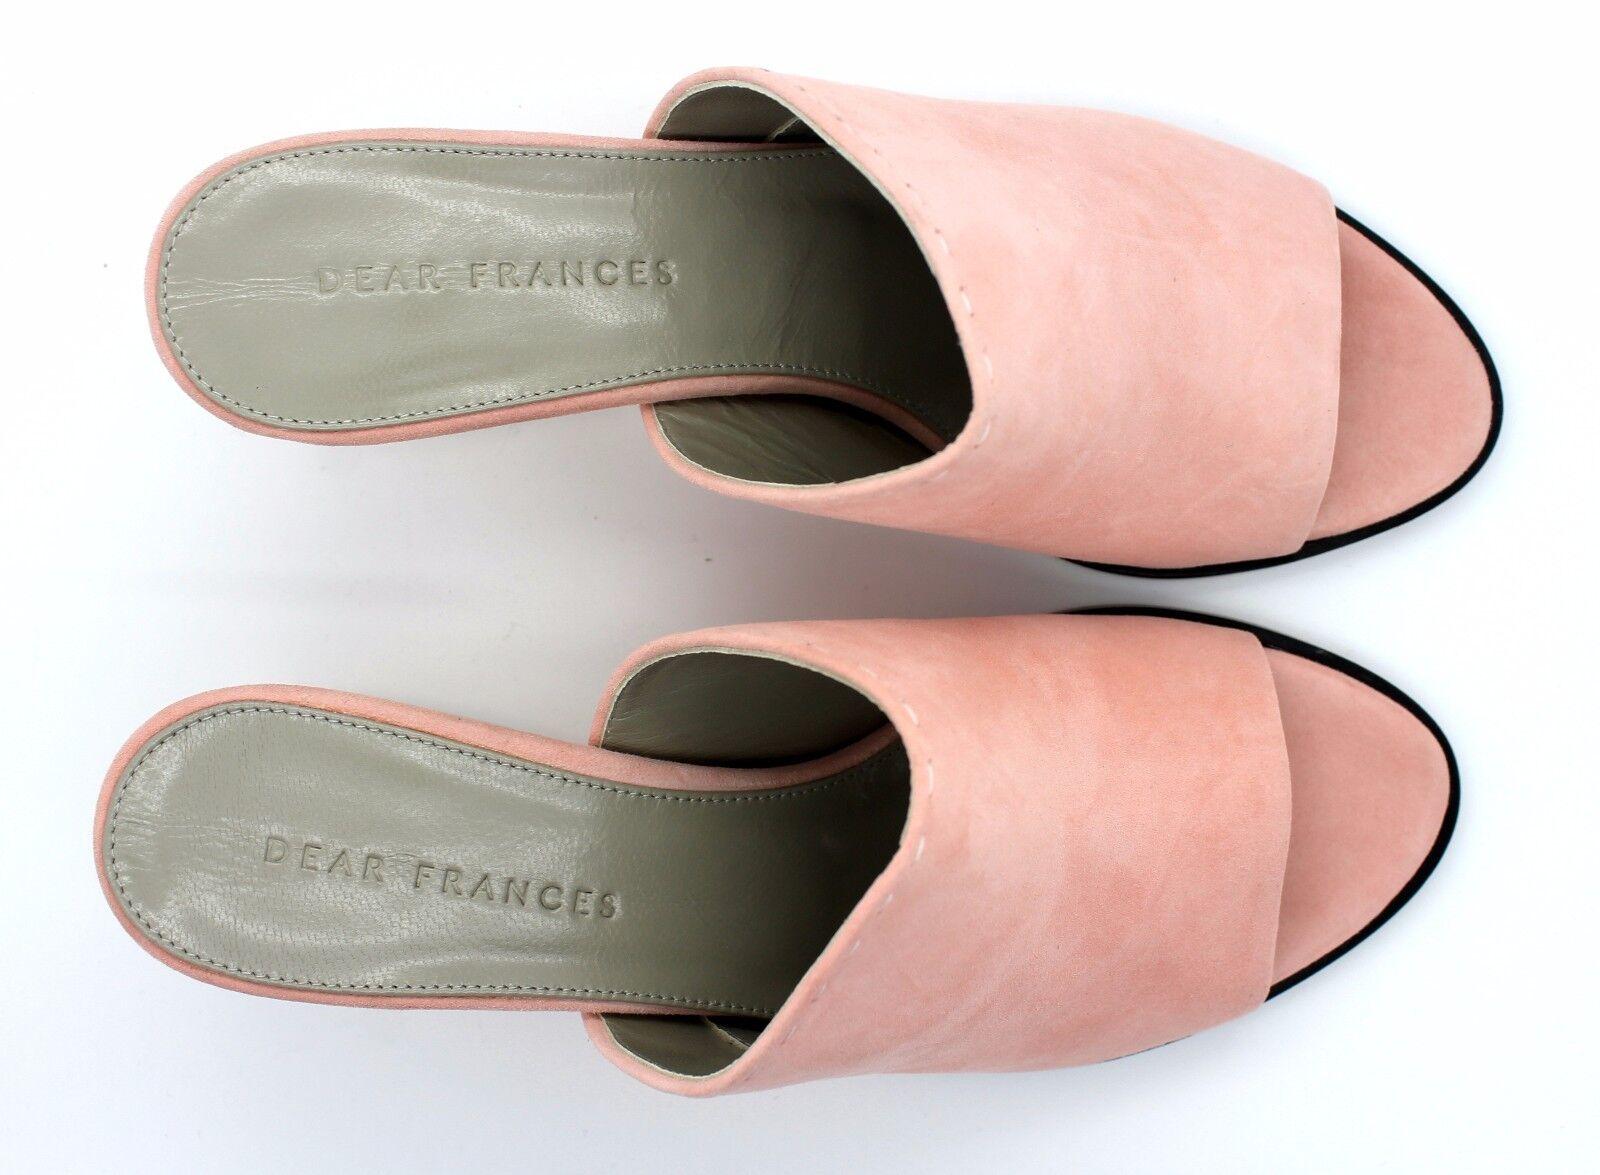 Dear Frances EU 38 Musk UK 5 Poser Mules Musk 38 Pink Open Toe Italian Designer Sandals a5cdae